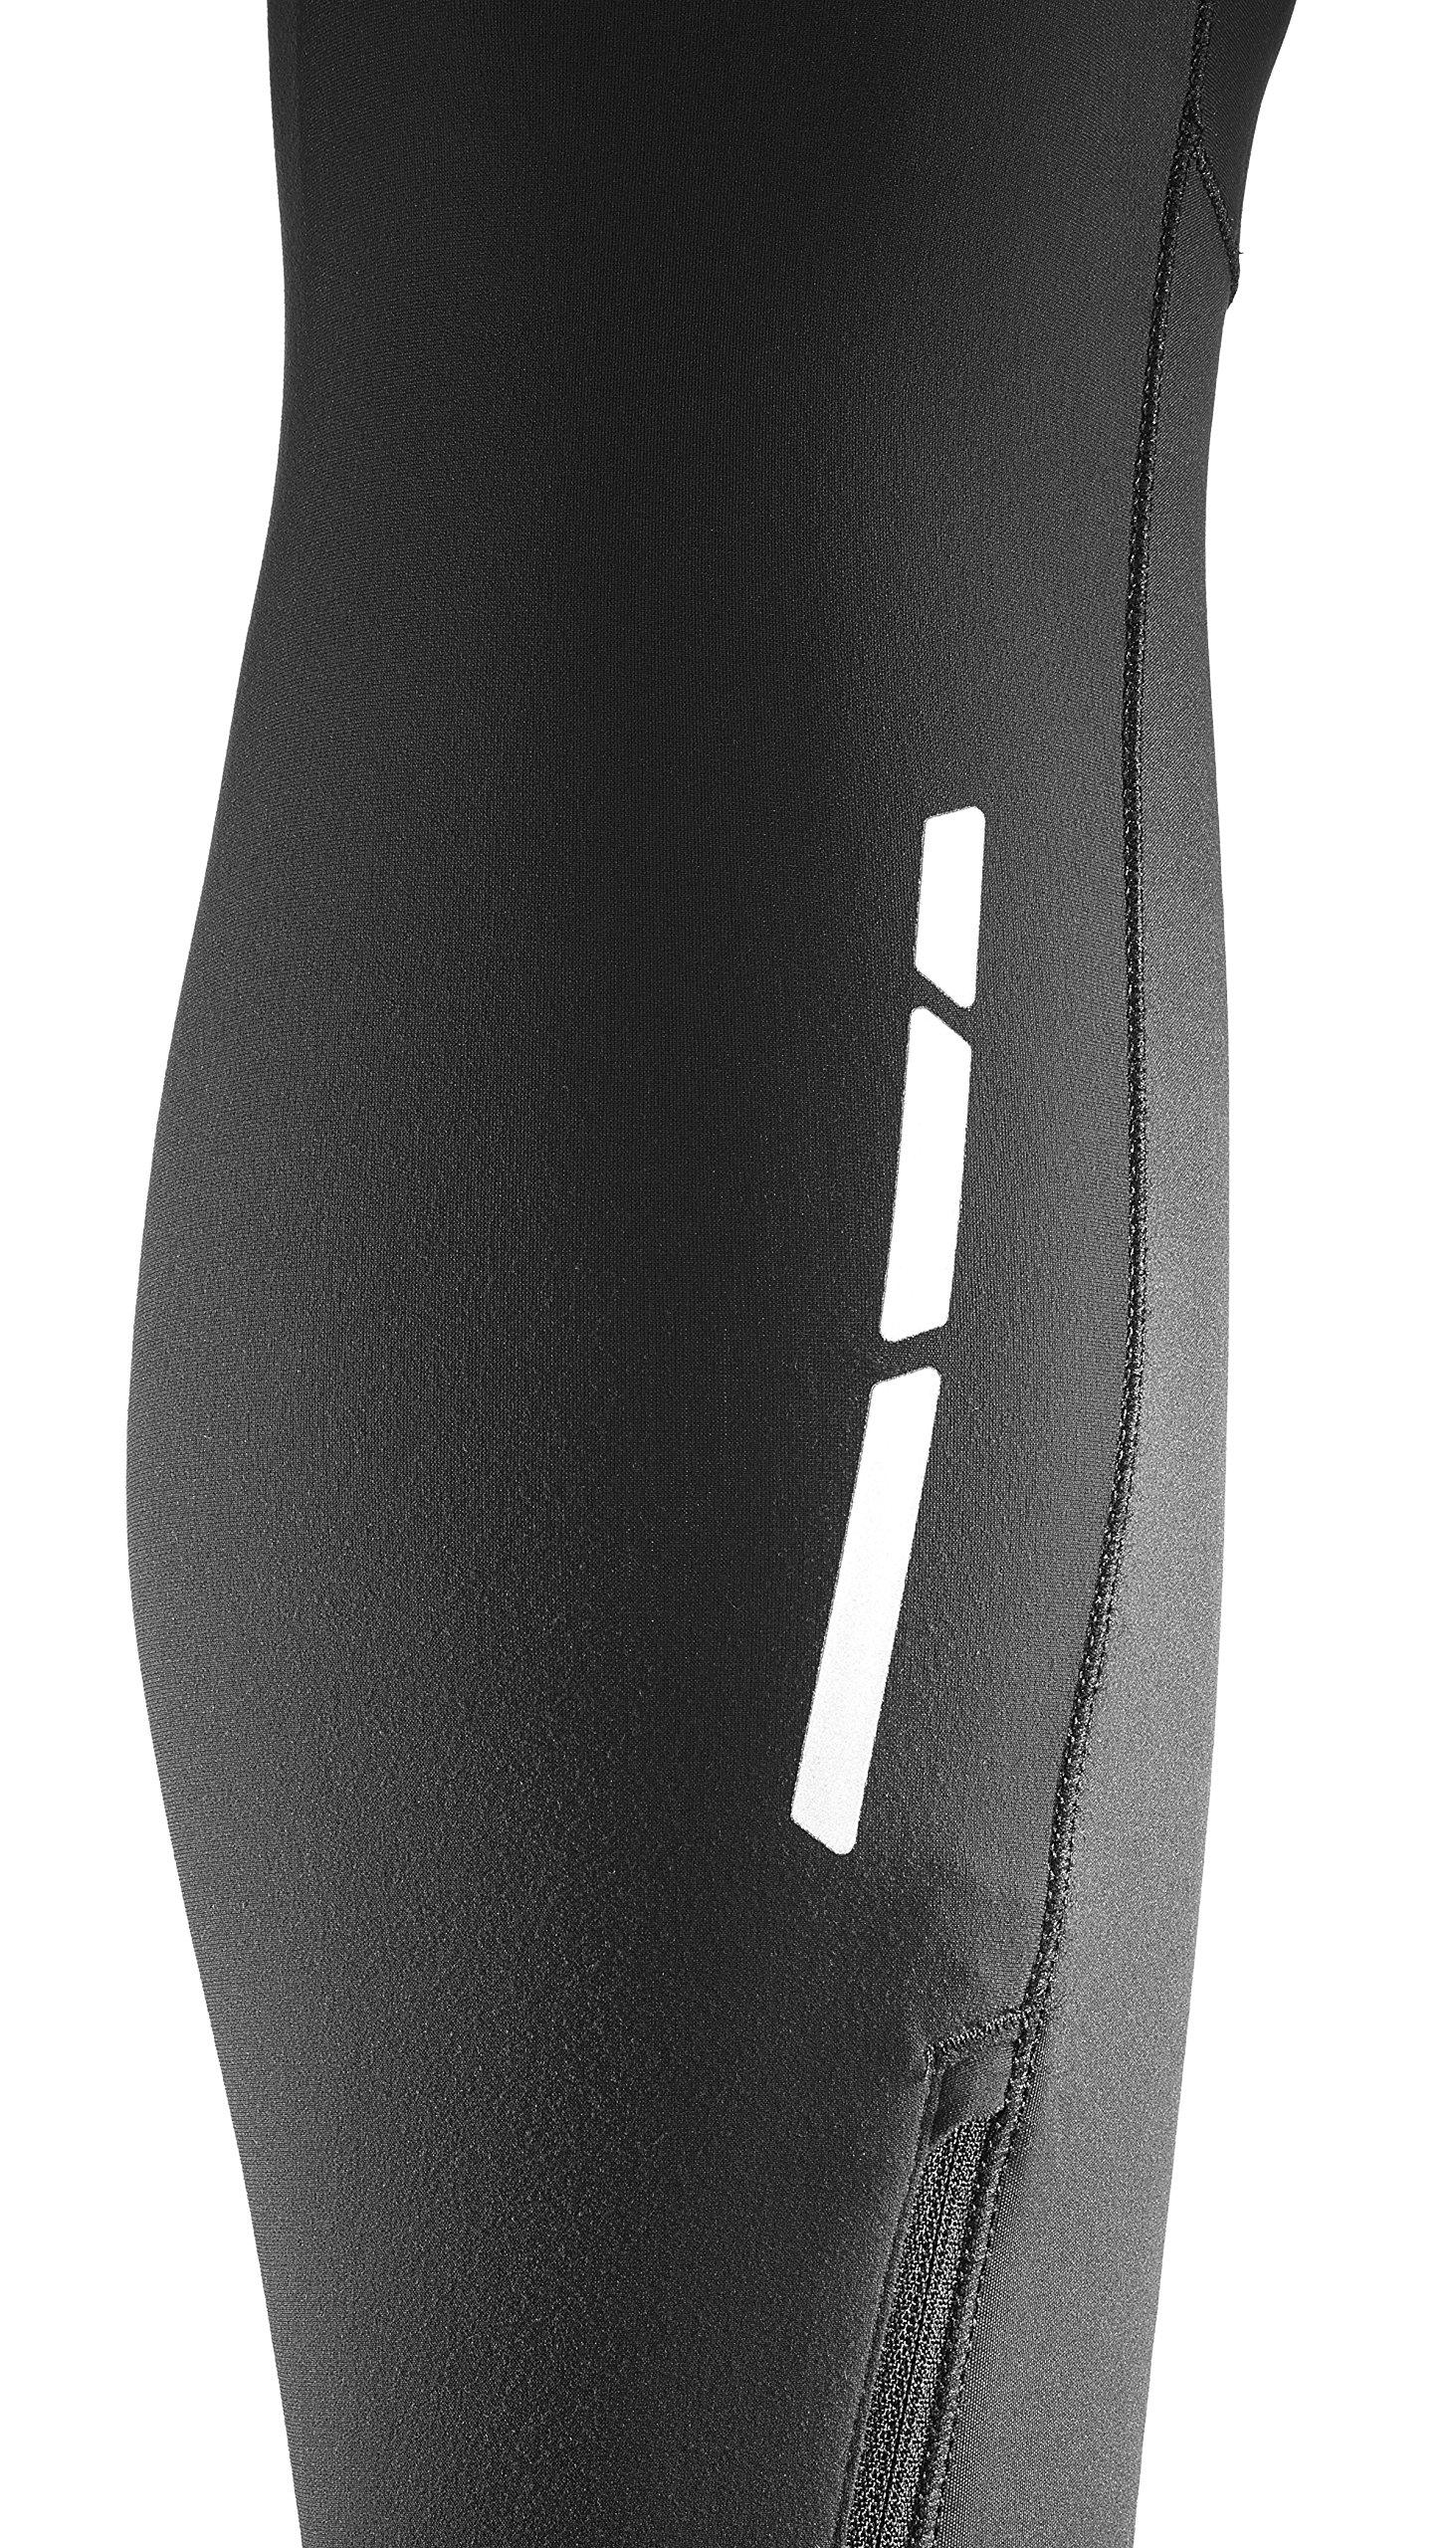 Salomon Men's Trail Runner WS Tight, Black, Large by Salomon (Image #5)